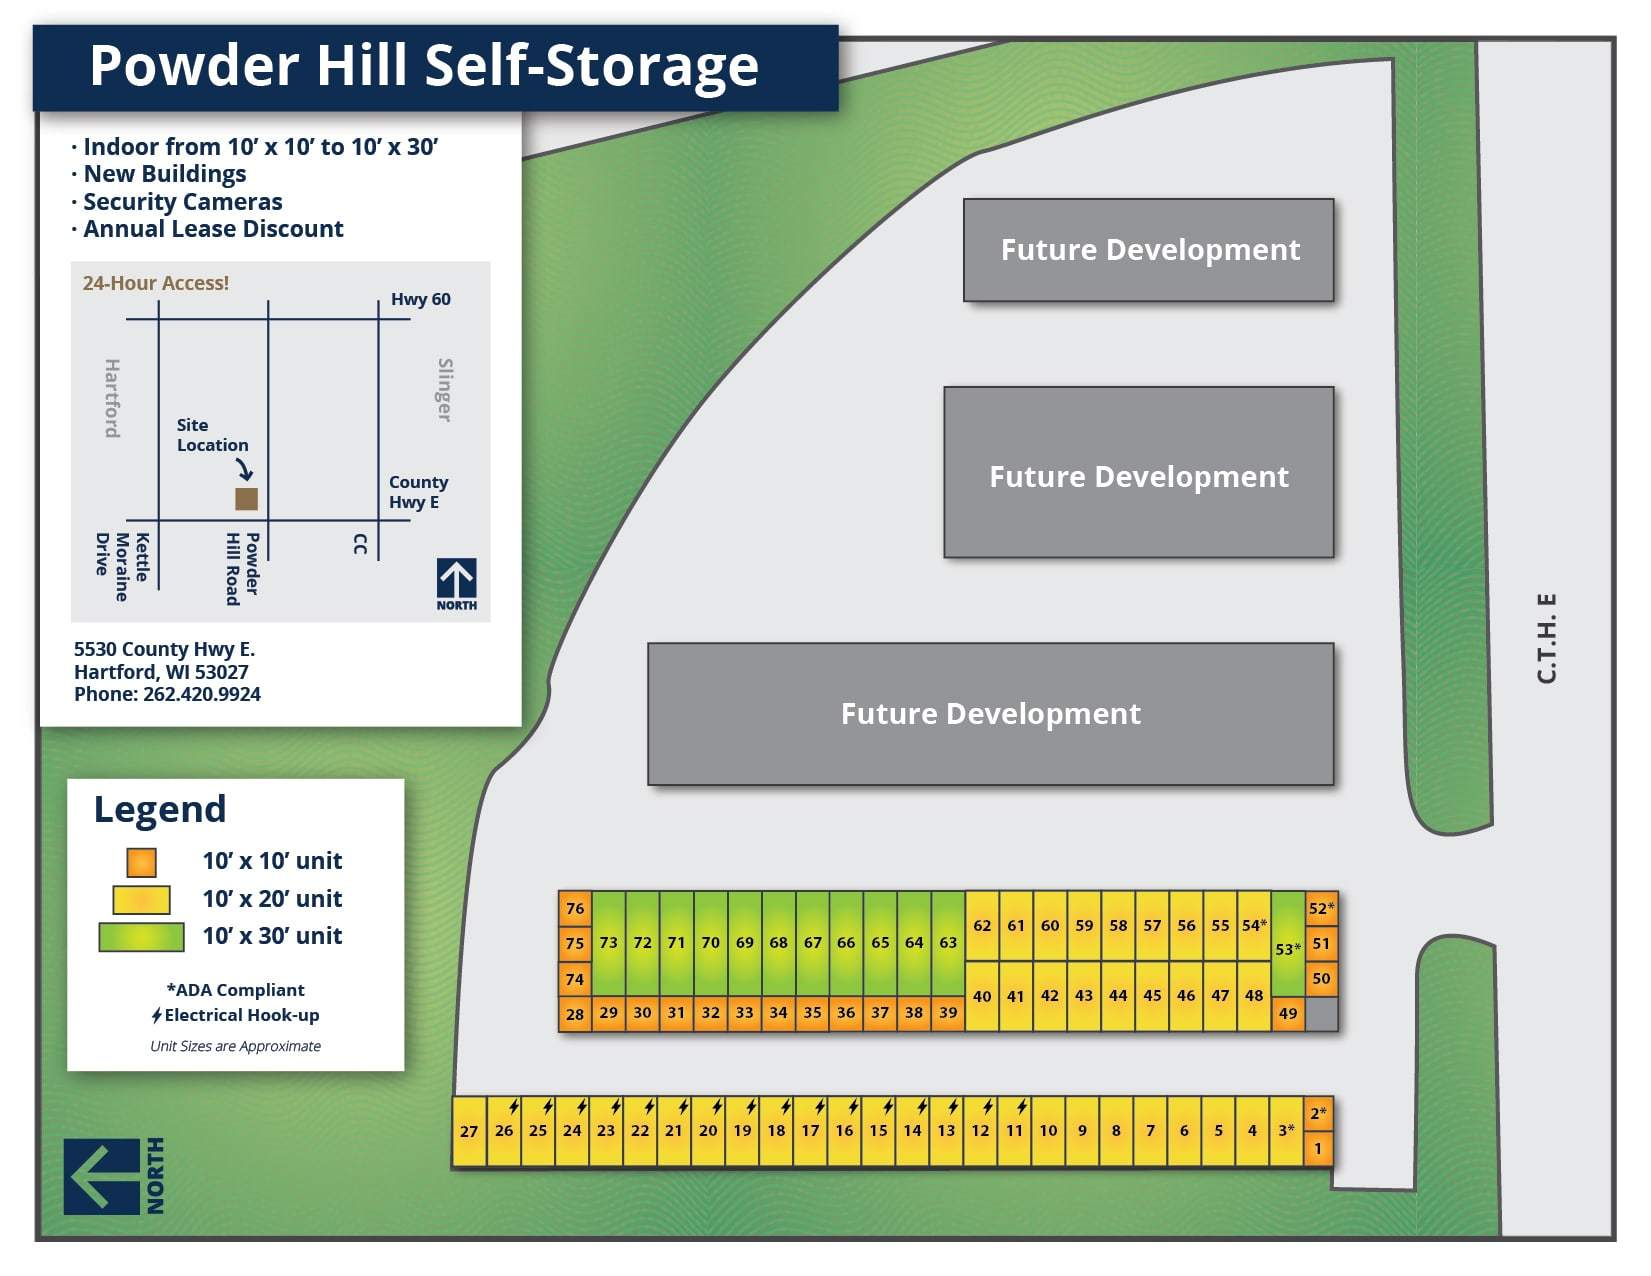 Powder Hill Self-Storage Map